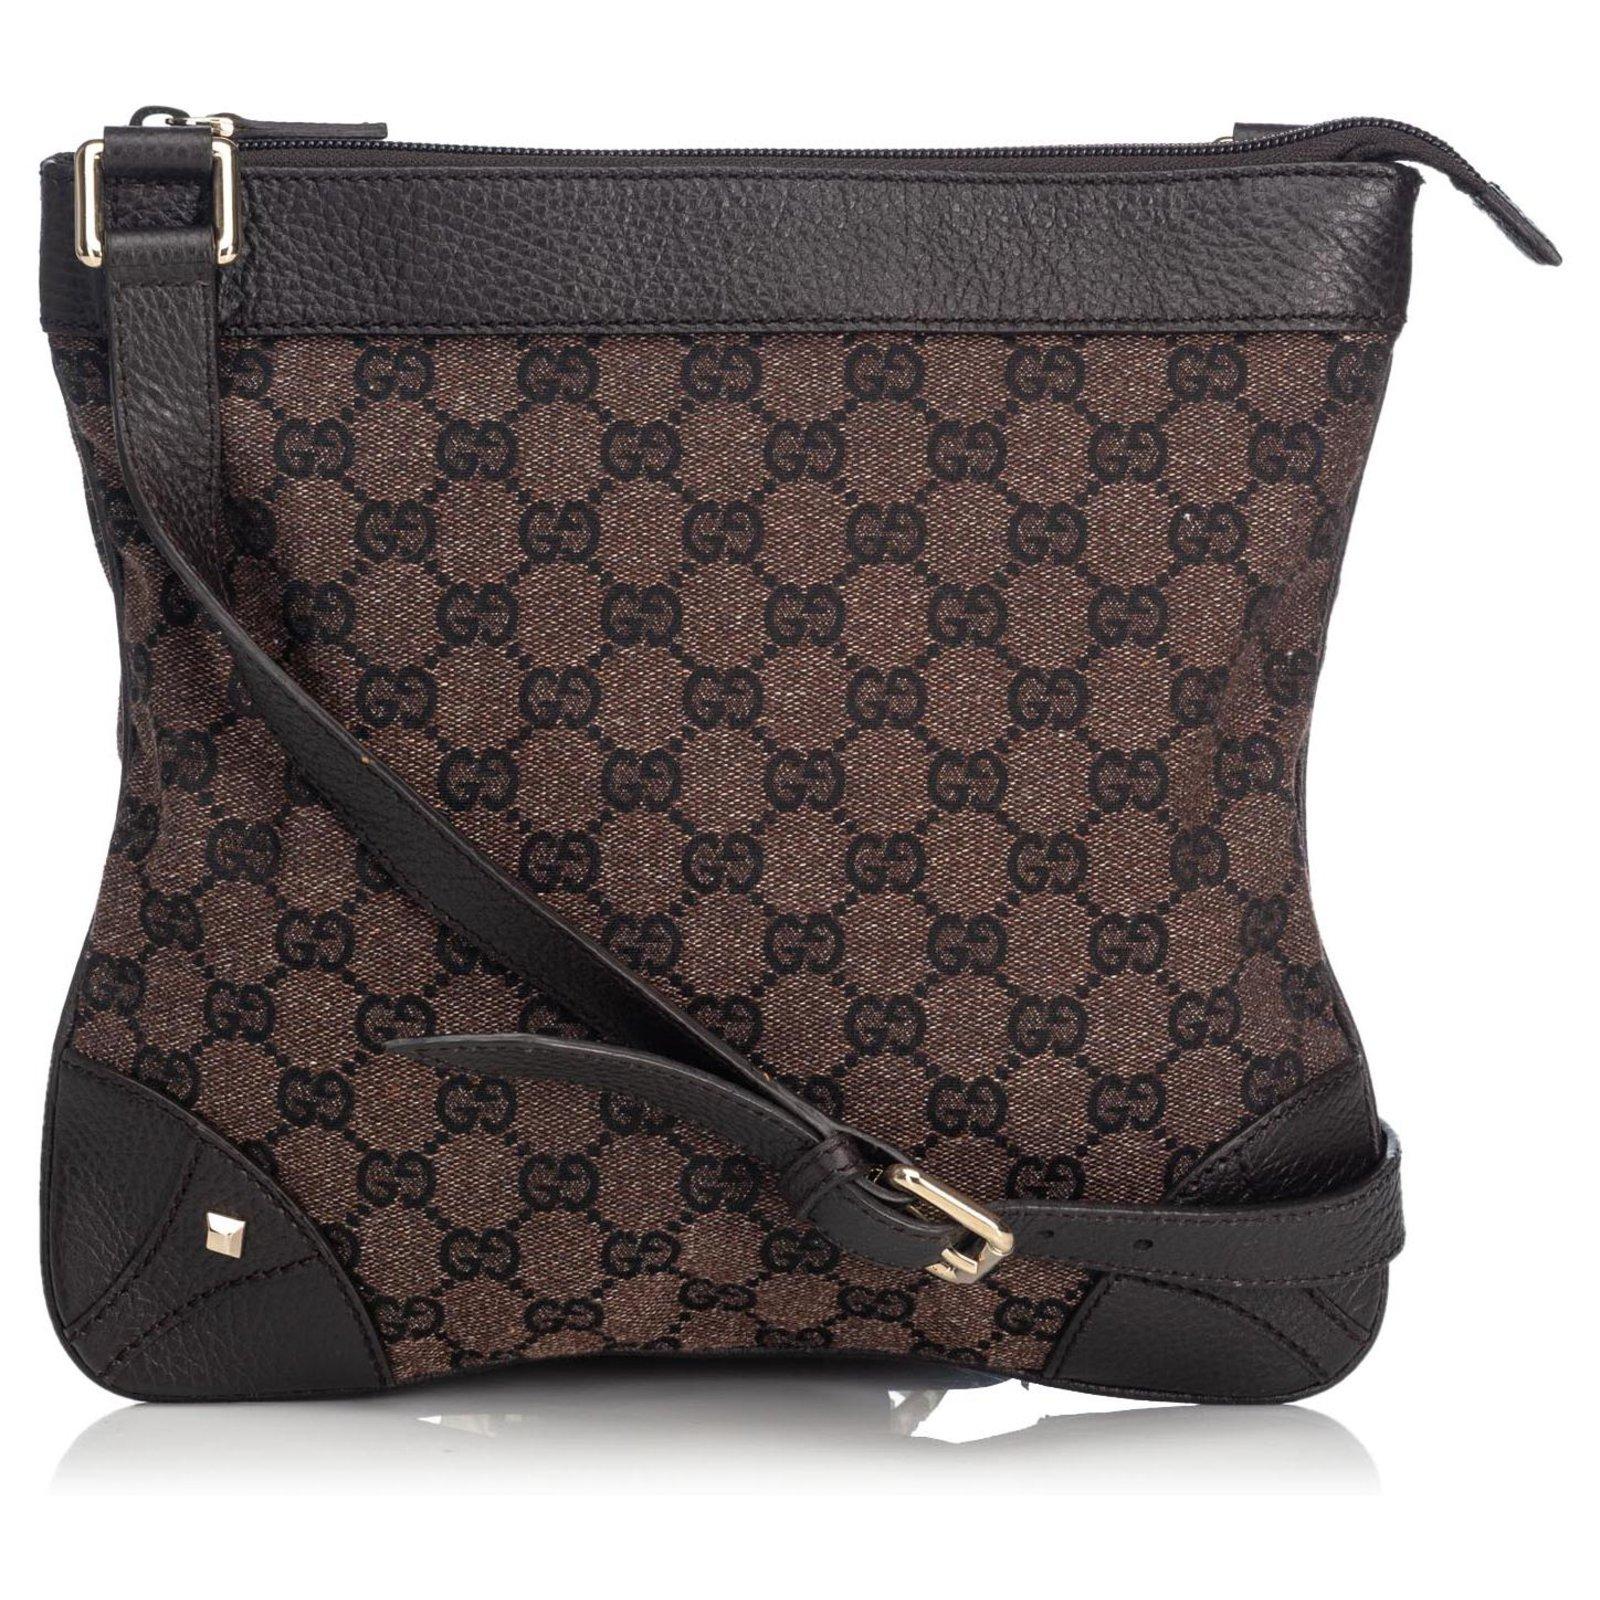 c81f5d19e Gucci Gucci Brown GG Canvas Nailhead Crossbody Bag Handbags Leather,Other,Cloth  Brown,